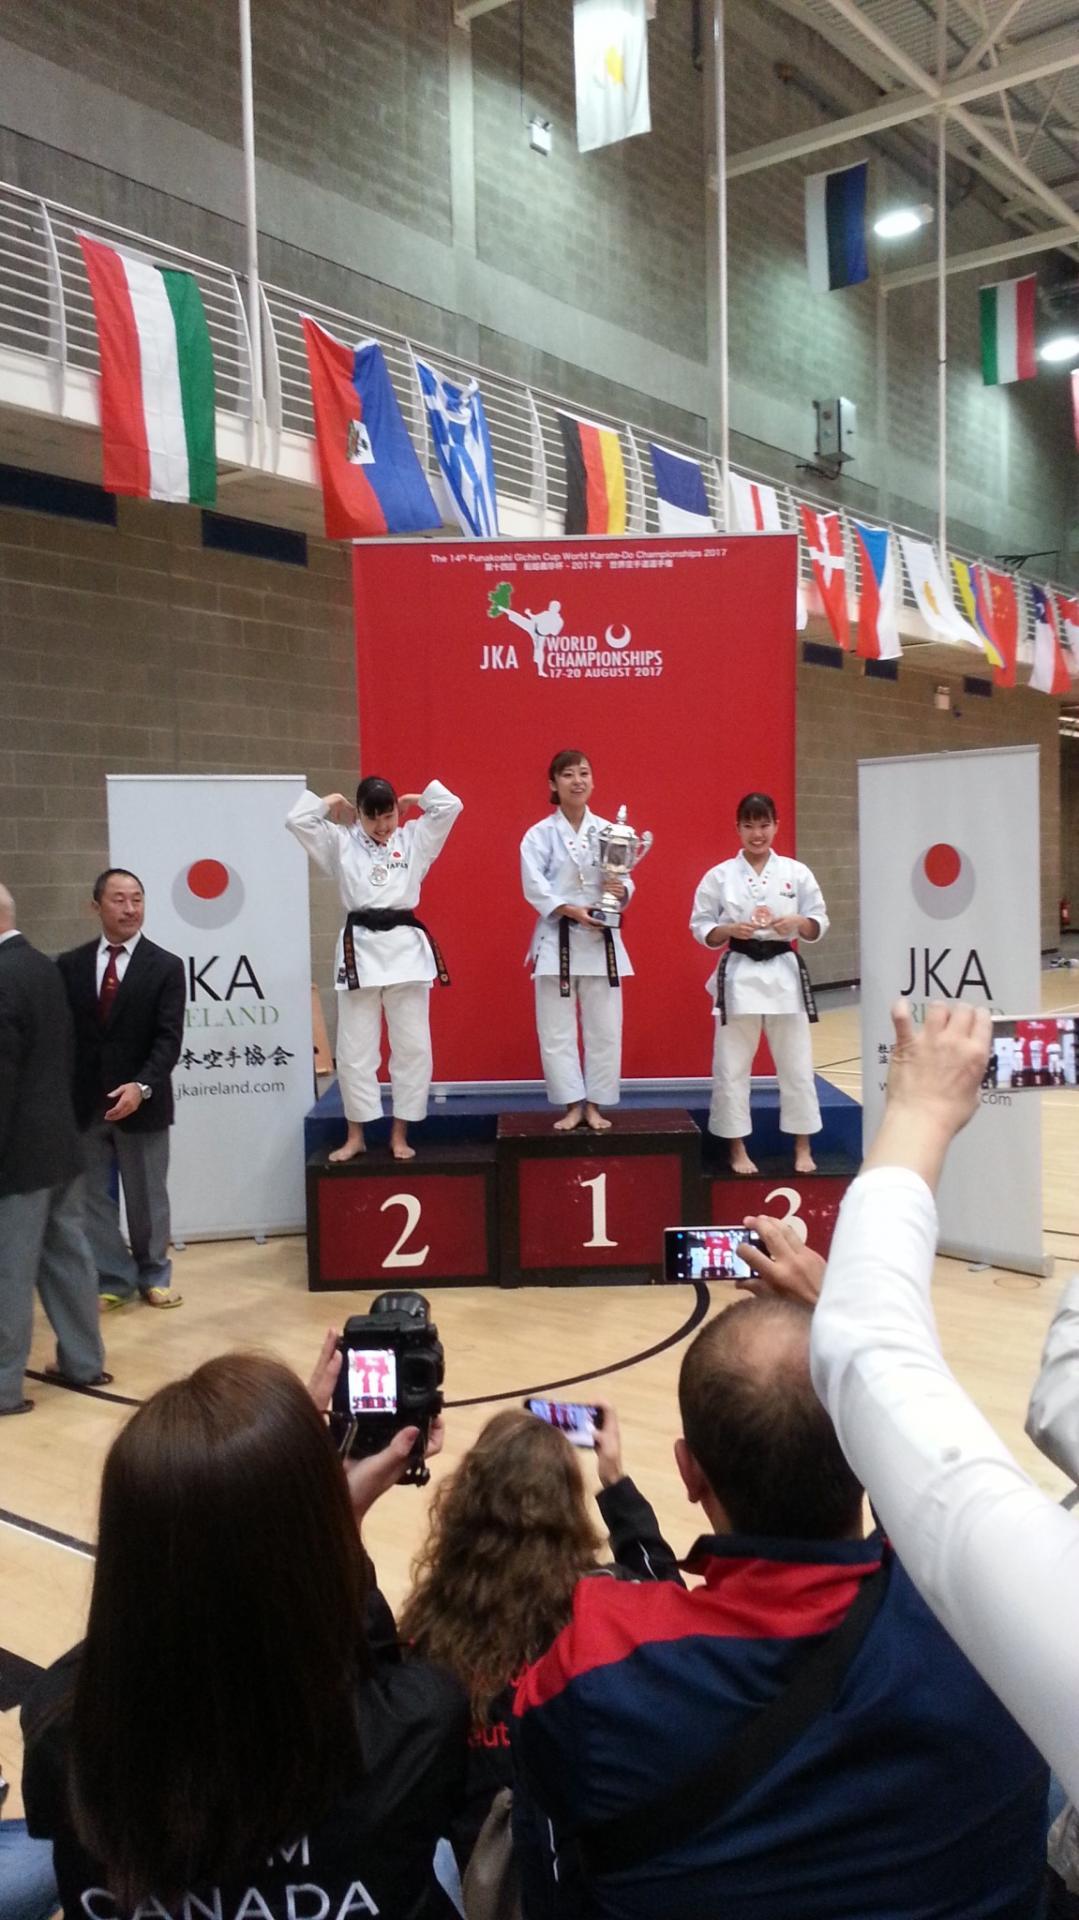 Championnat du Monde Jka 2017 à Limerick